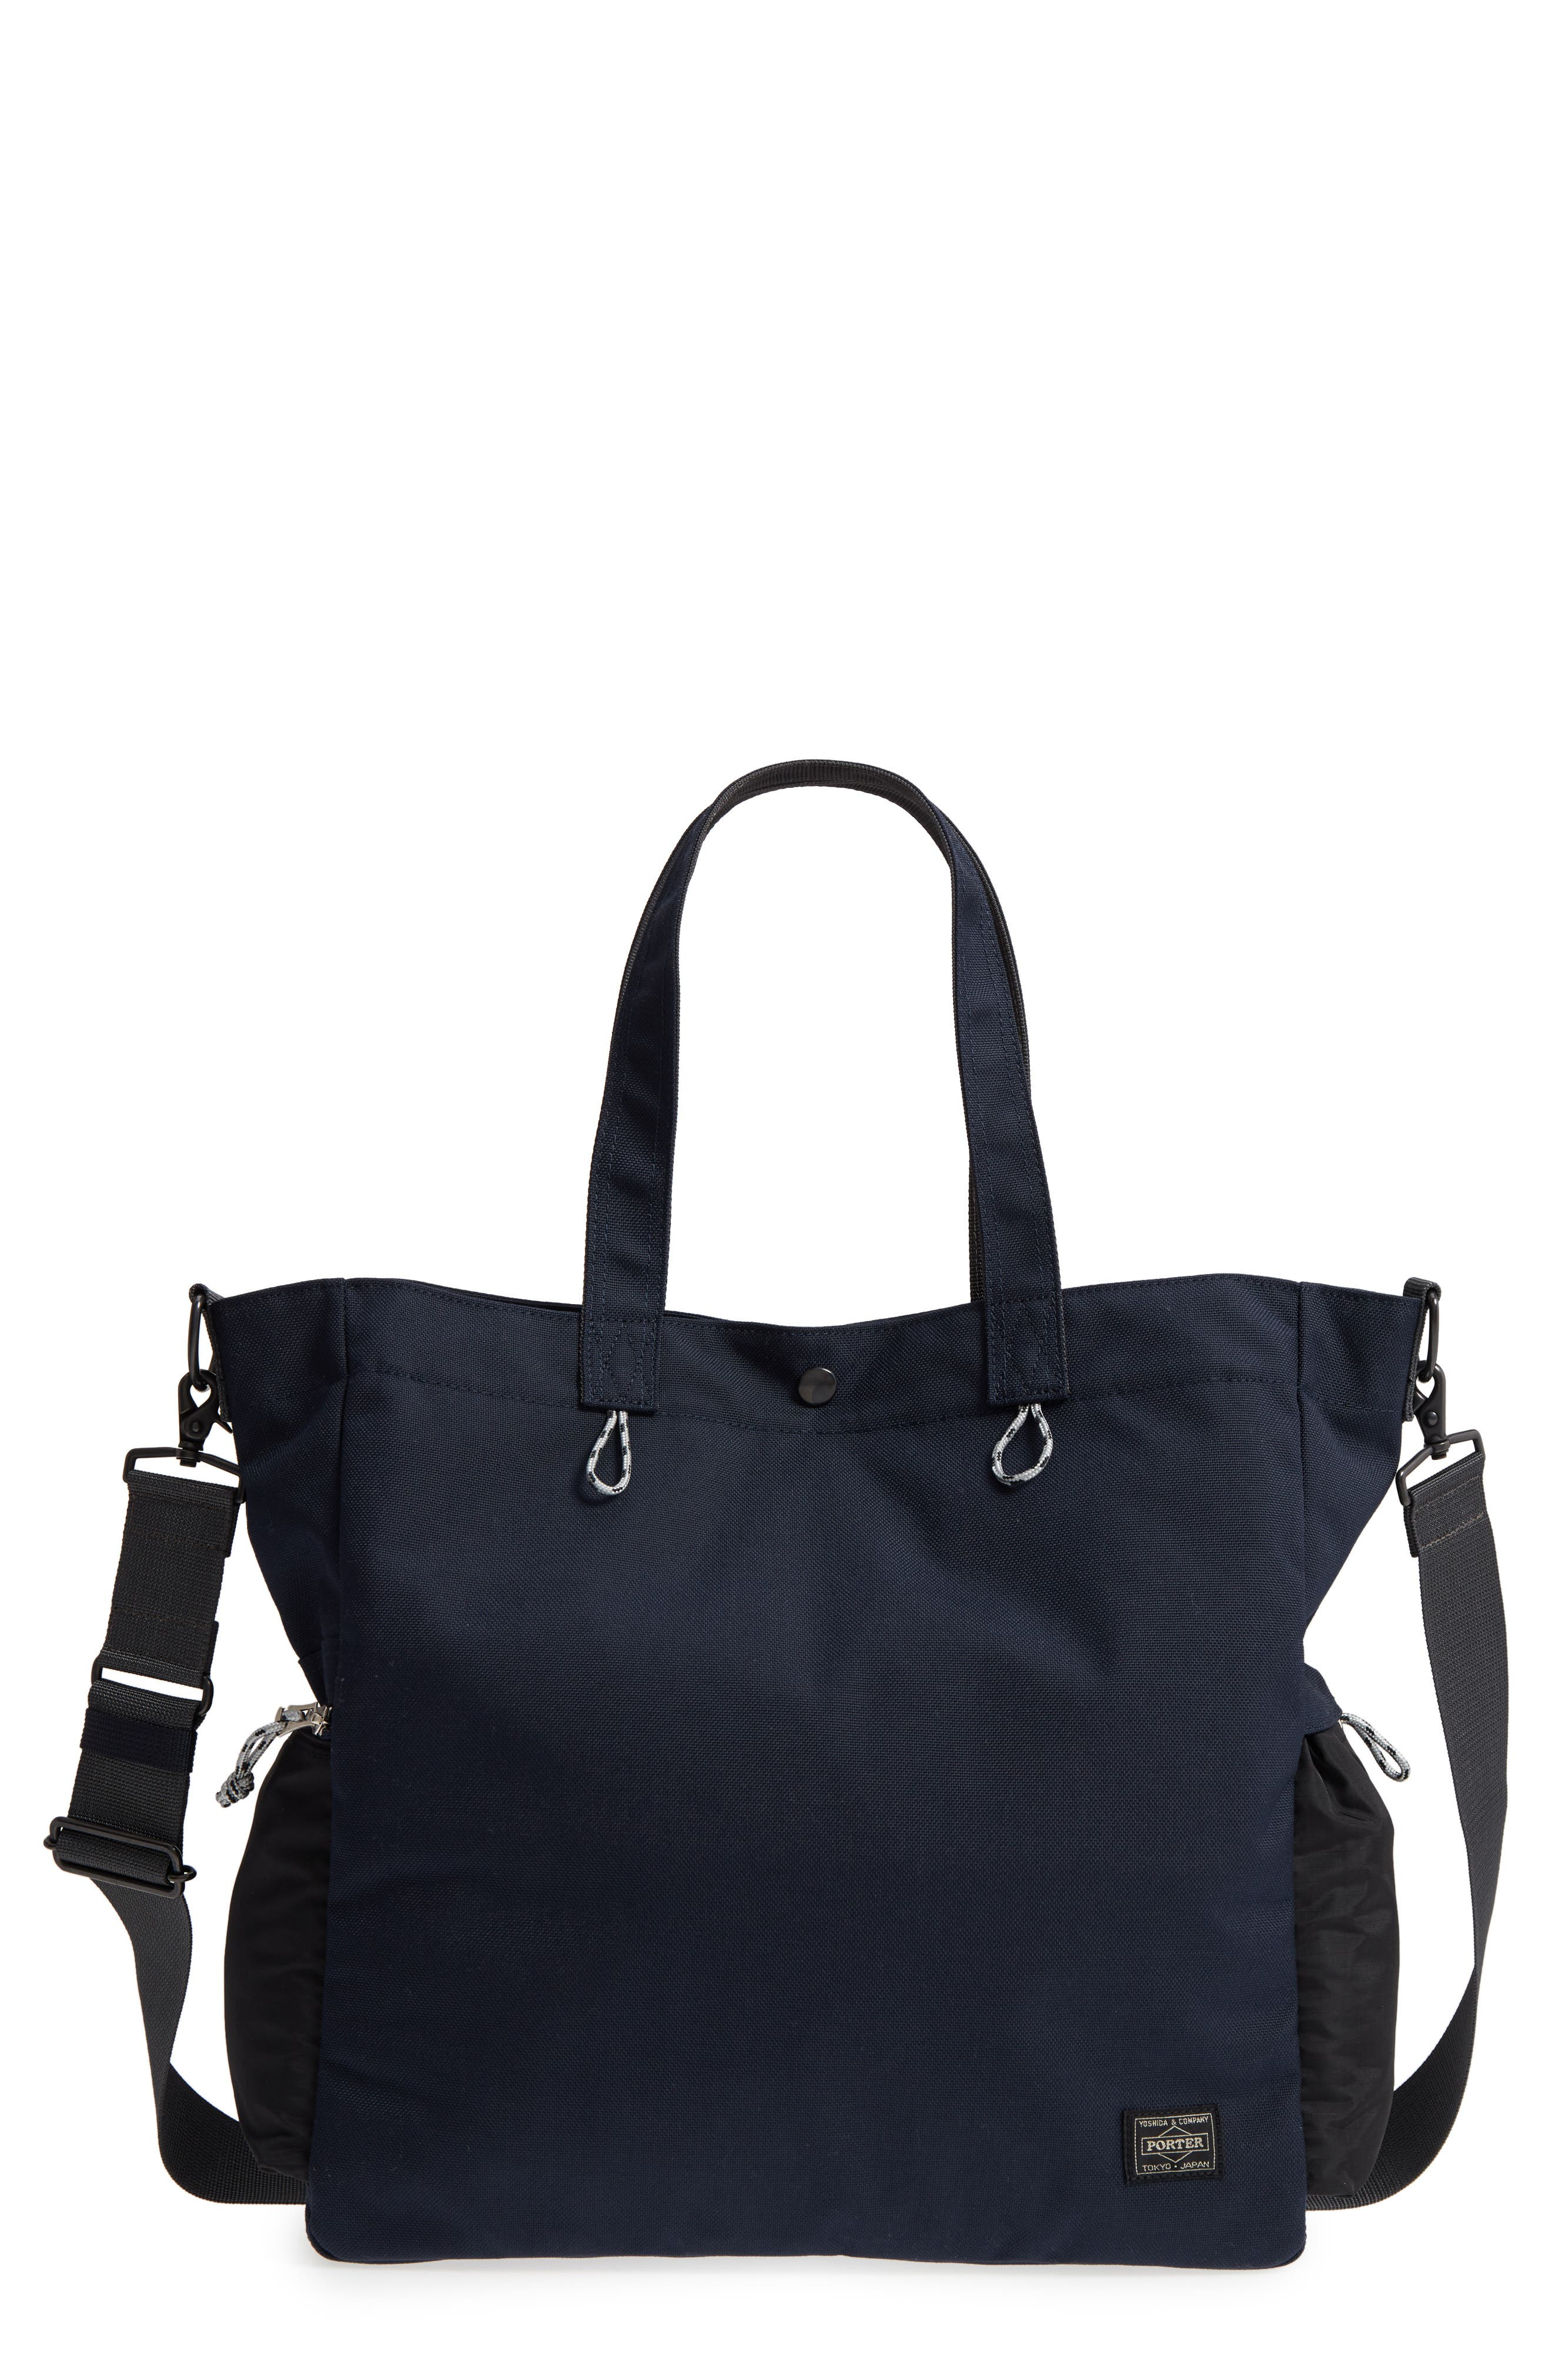 Porter-Yoshida & Co. Hype Tote Bag,                         Main,                         color, 400